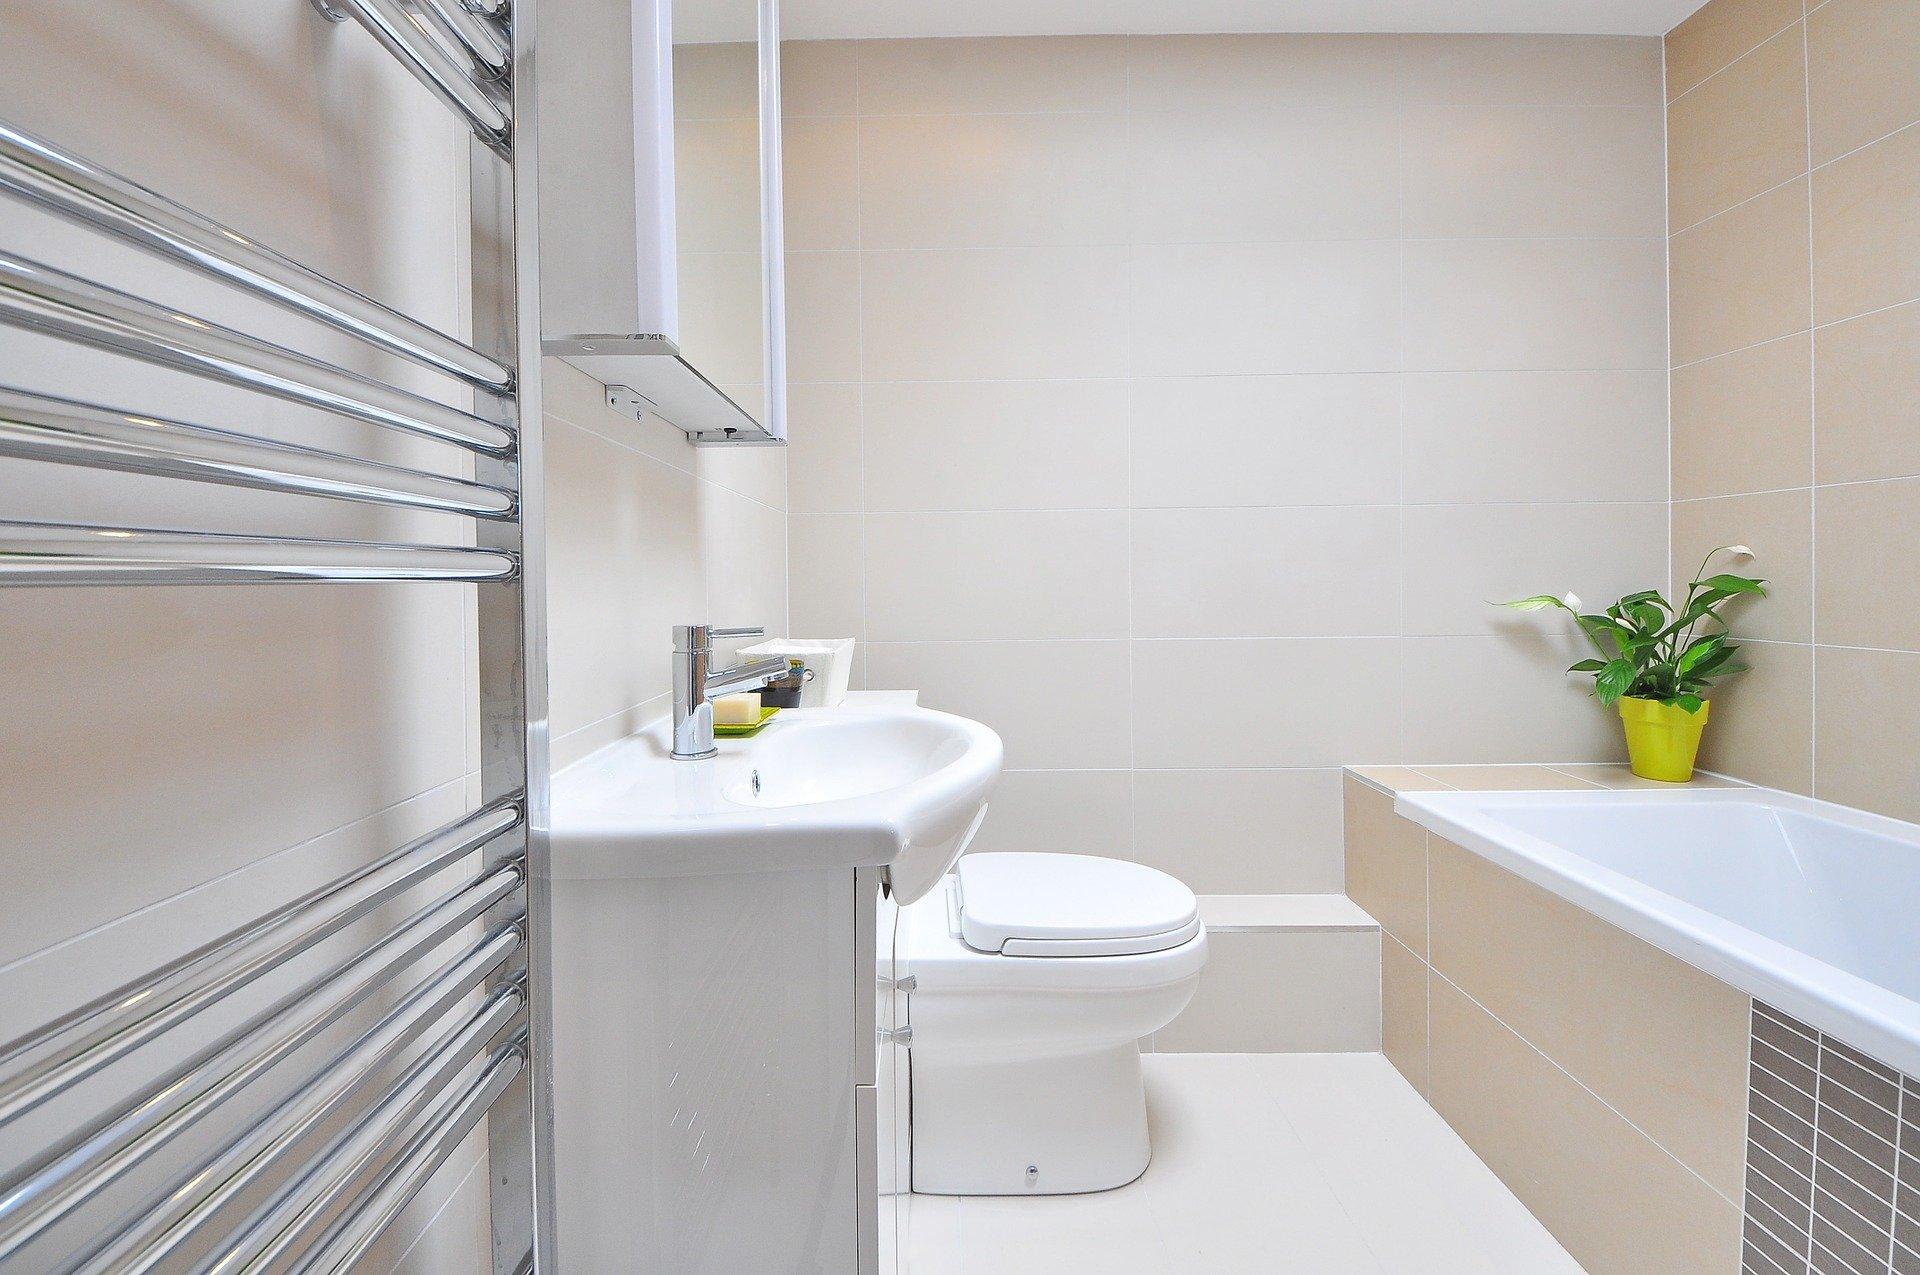 Astuces pour aménager une salle de bain